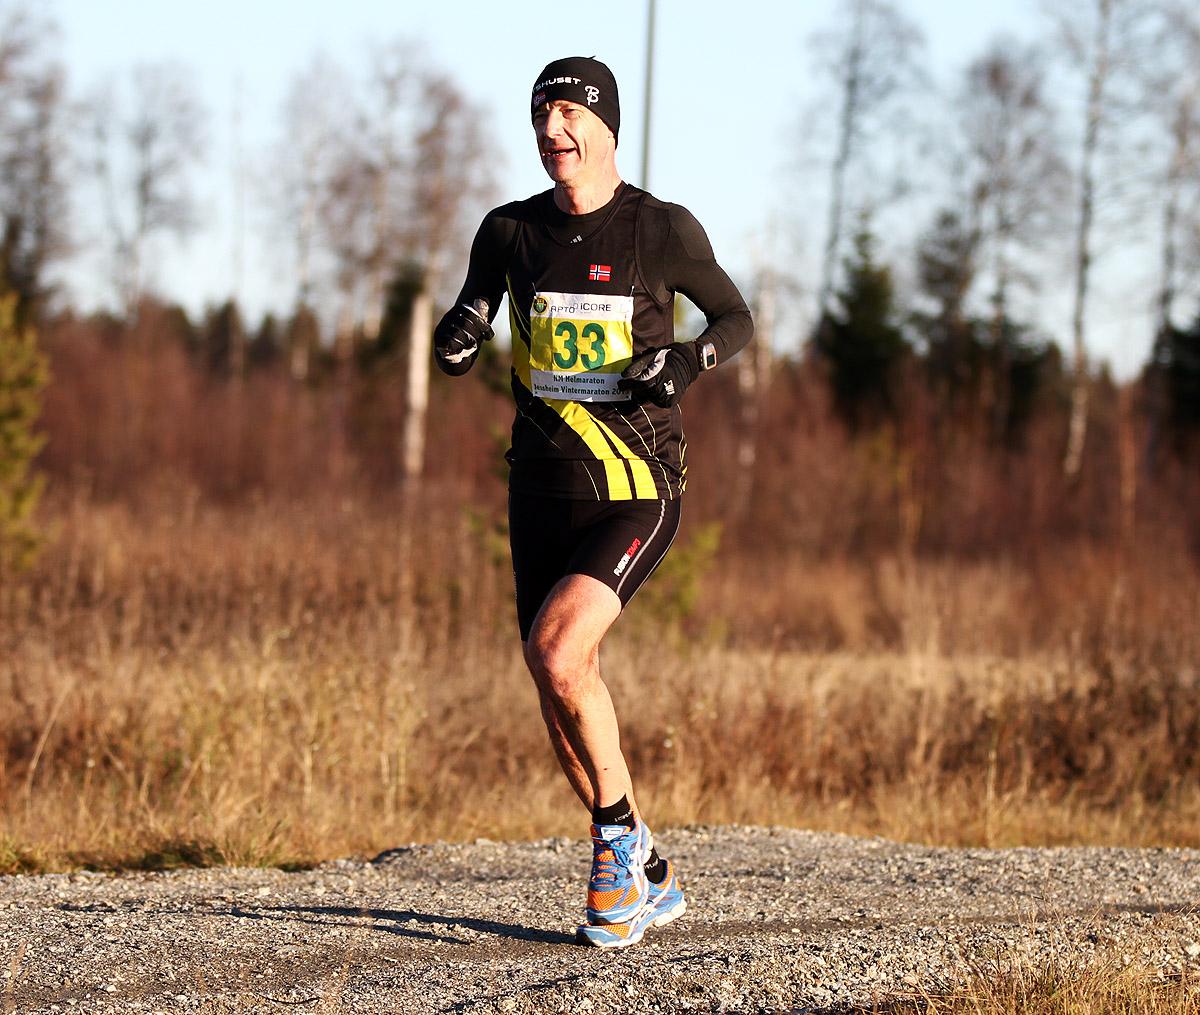 Vintermaraton2013_John-Lund_31-3km.jpg